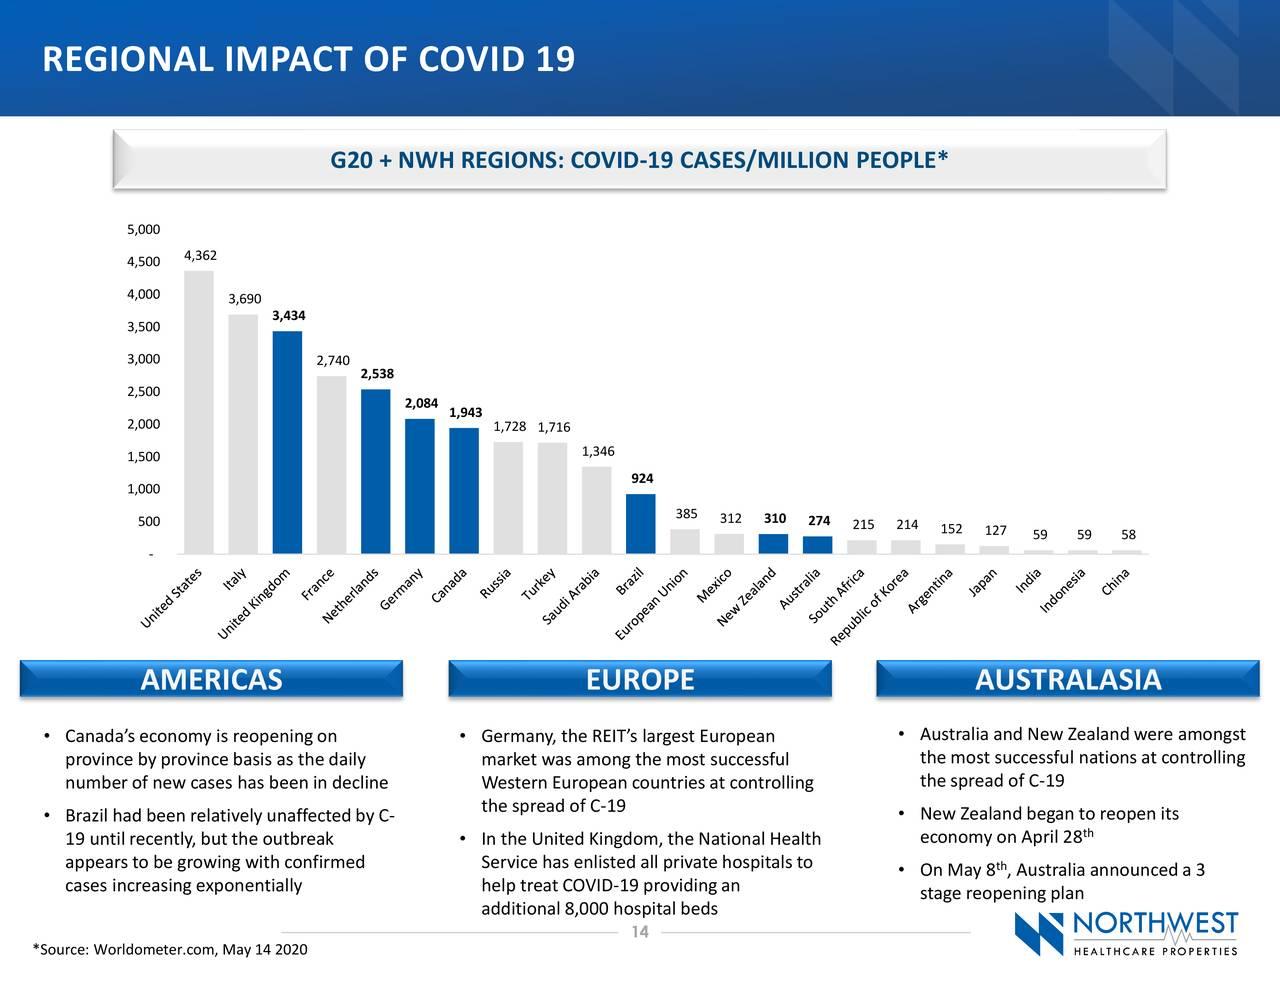 IMPACTO REGIONAL DE COVID 19